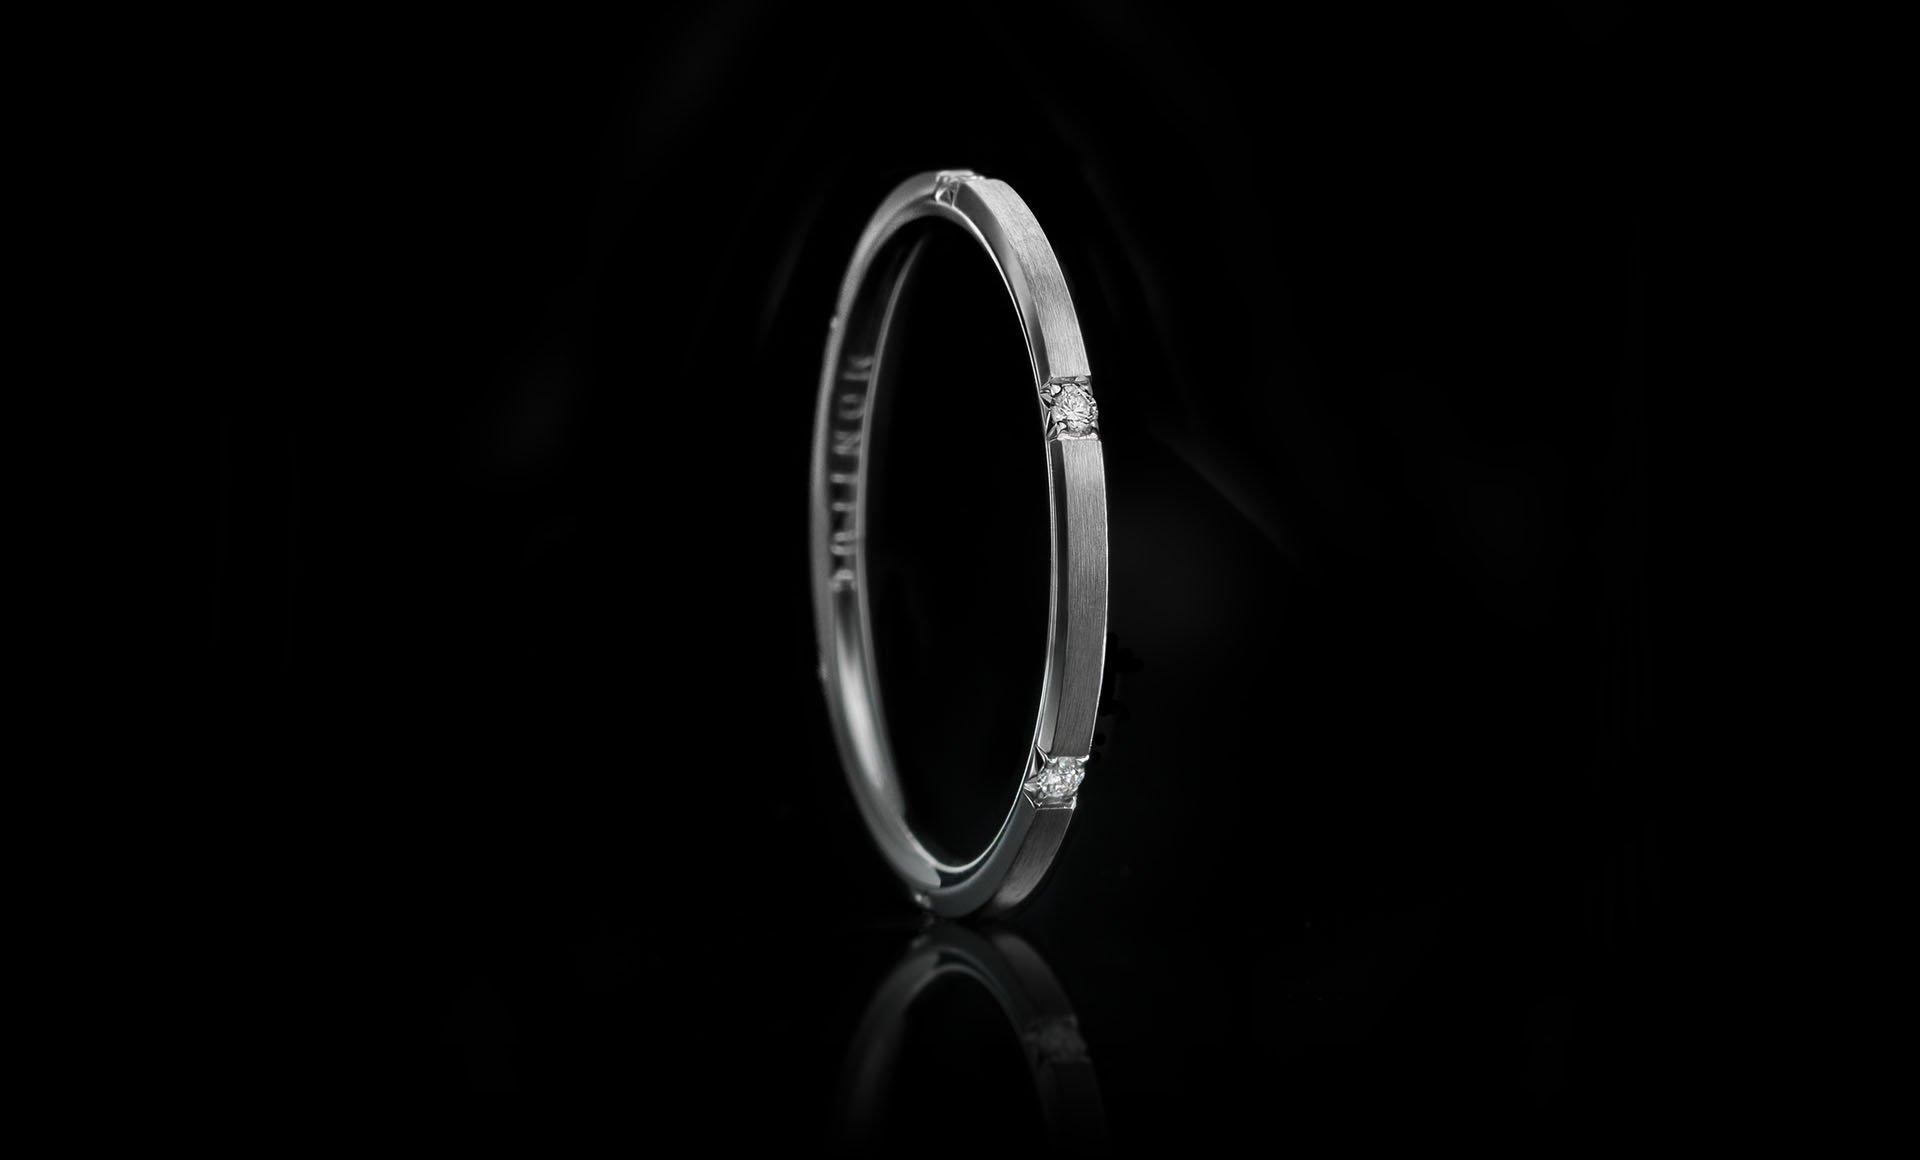 Montluc - Halo No 3 Matte. Diamond ring set with 6 perfect, brilliant cut diamonds. Matte finish.